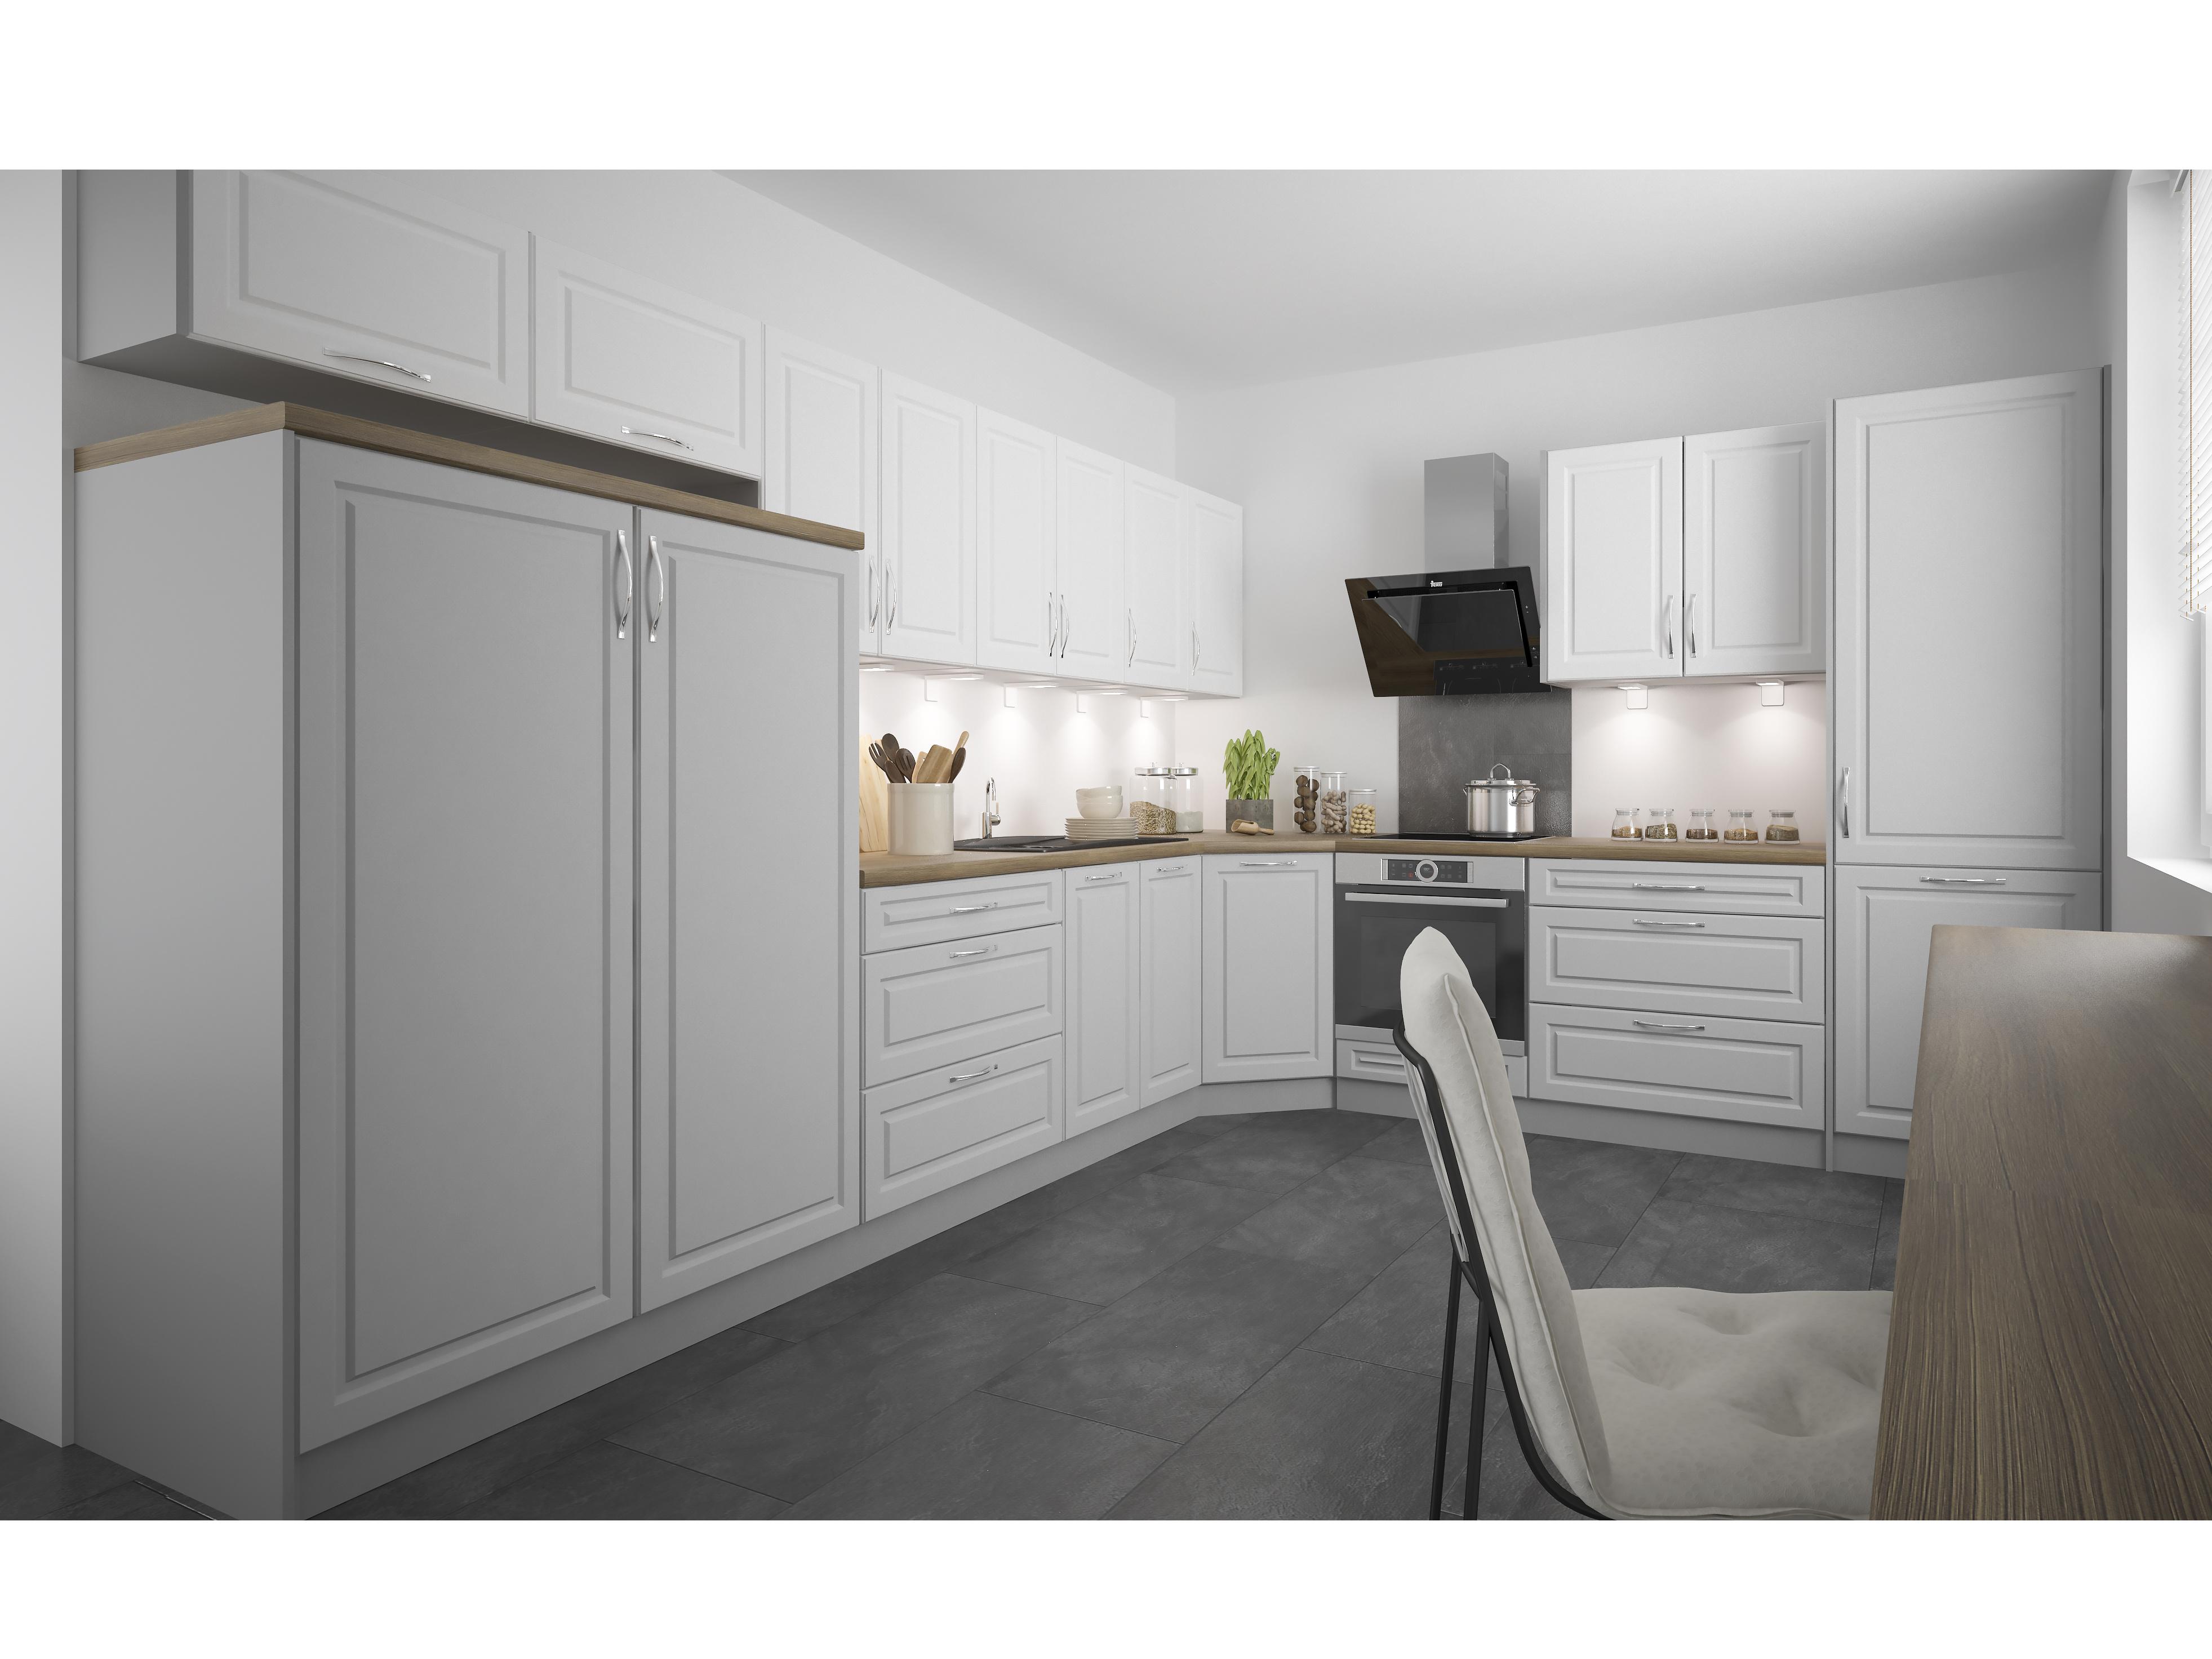 Extom Rohová kuchyně EMPORIUM 450/570 cm, korpus grey, dvířka light grey stone + white